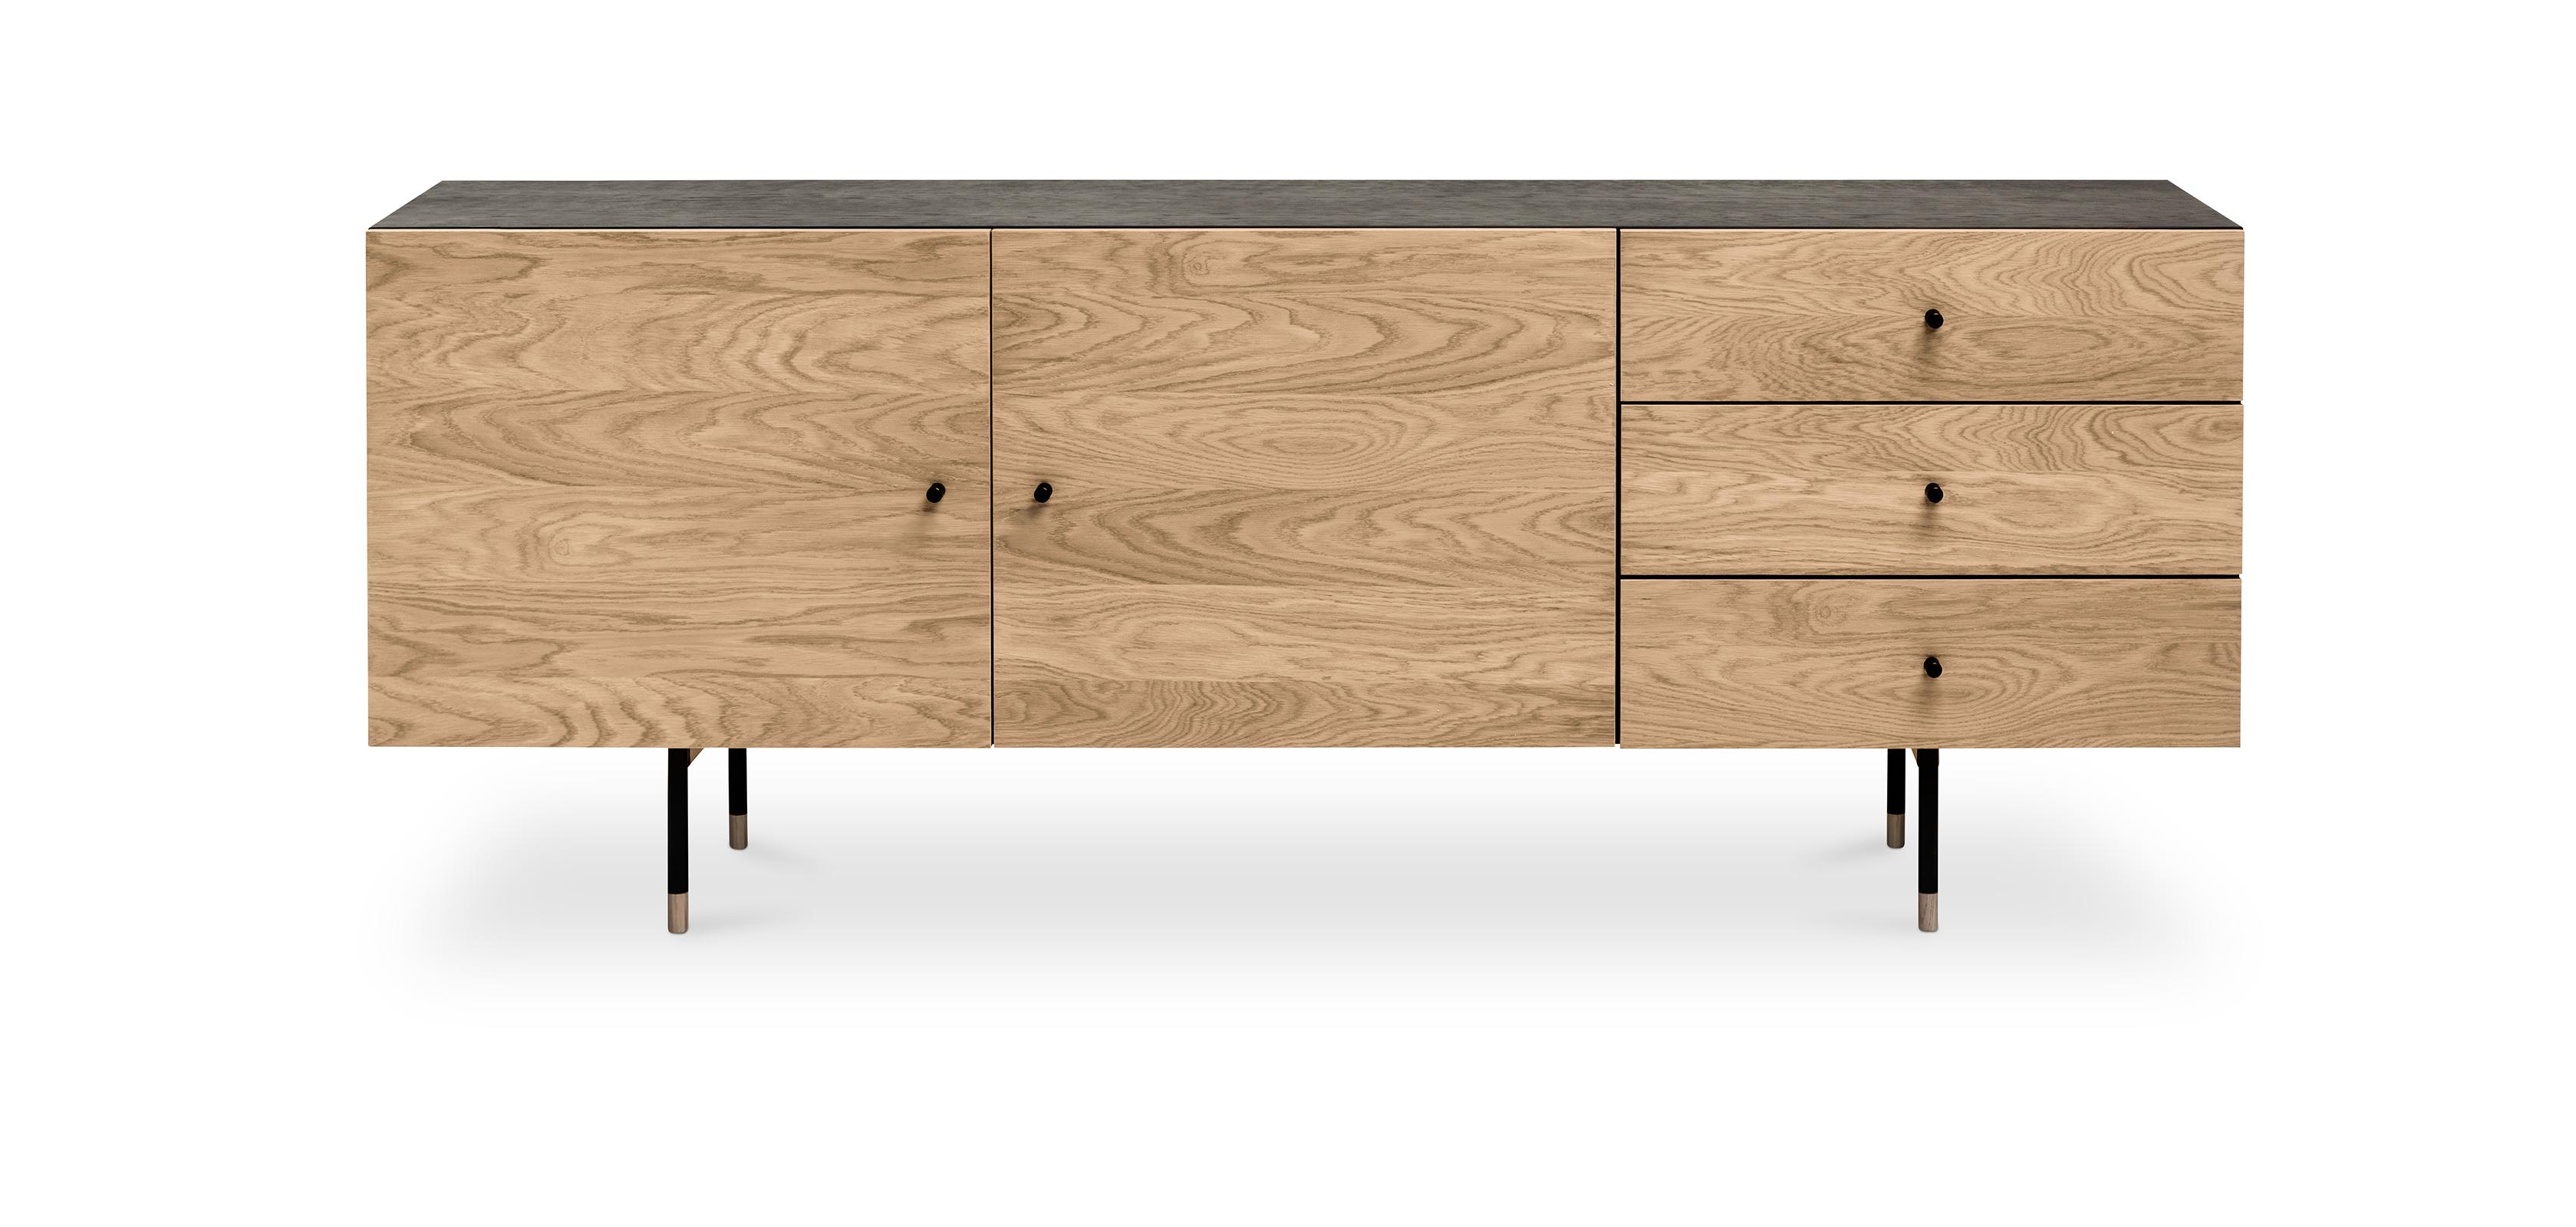 Buffet en bois bicolore de style scandinave Jafre